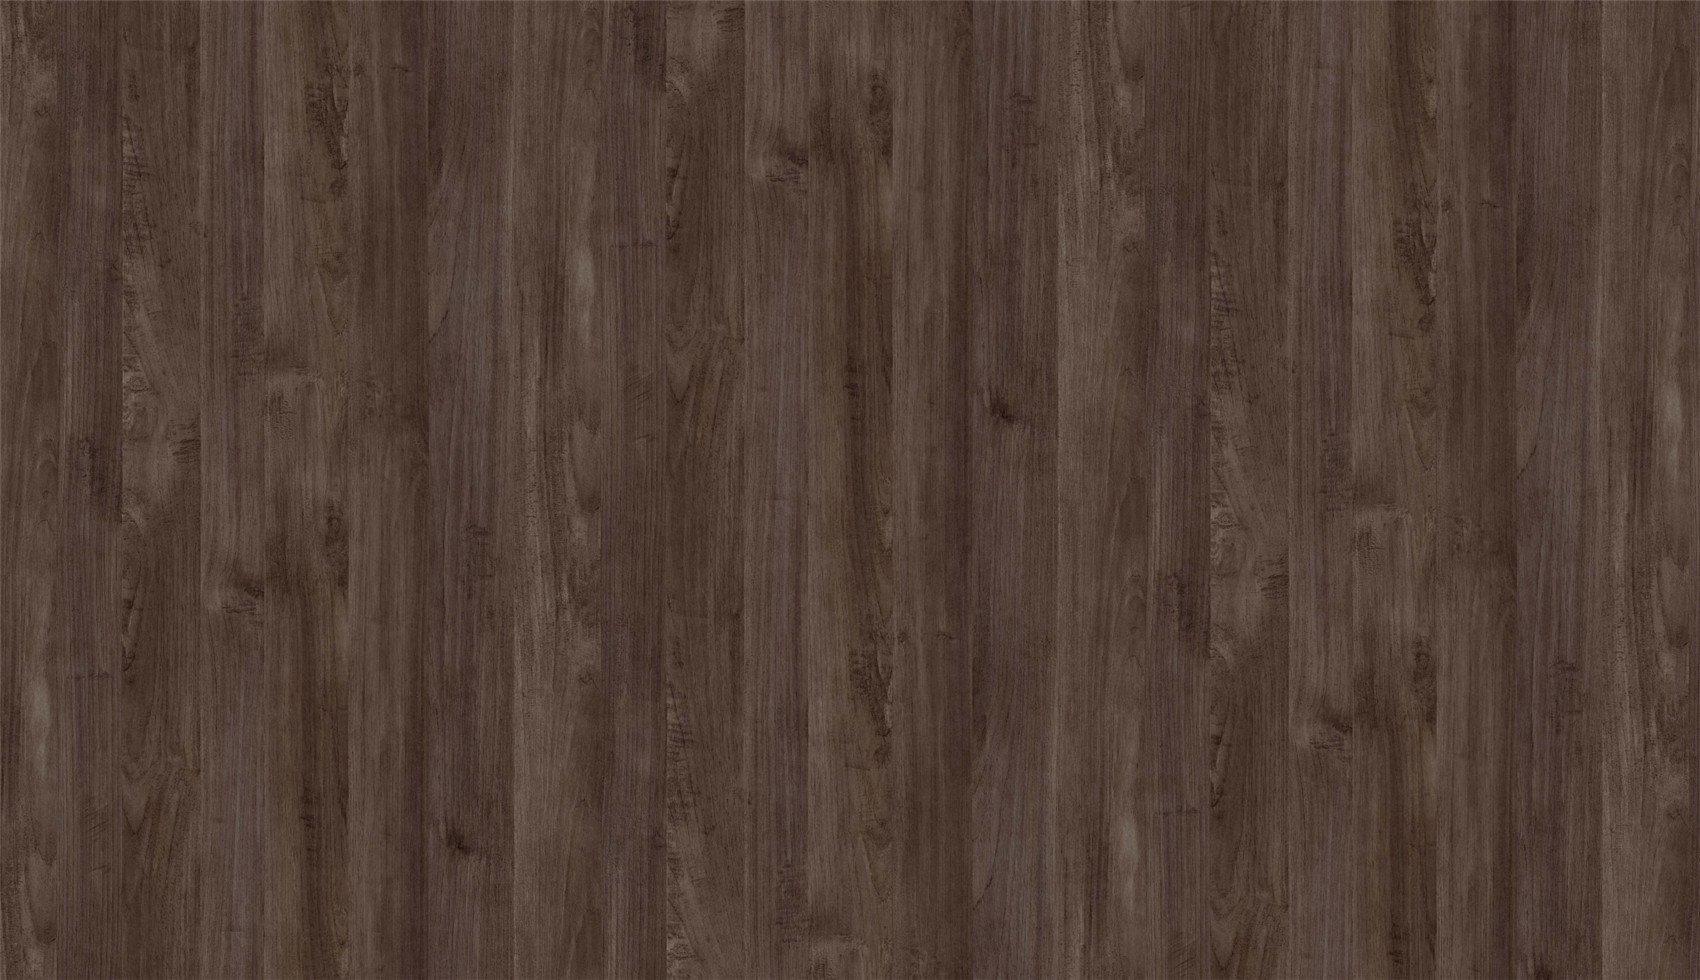 78209  idecor decor paper oak up to 7ft